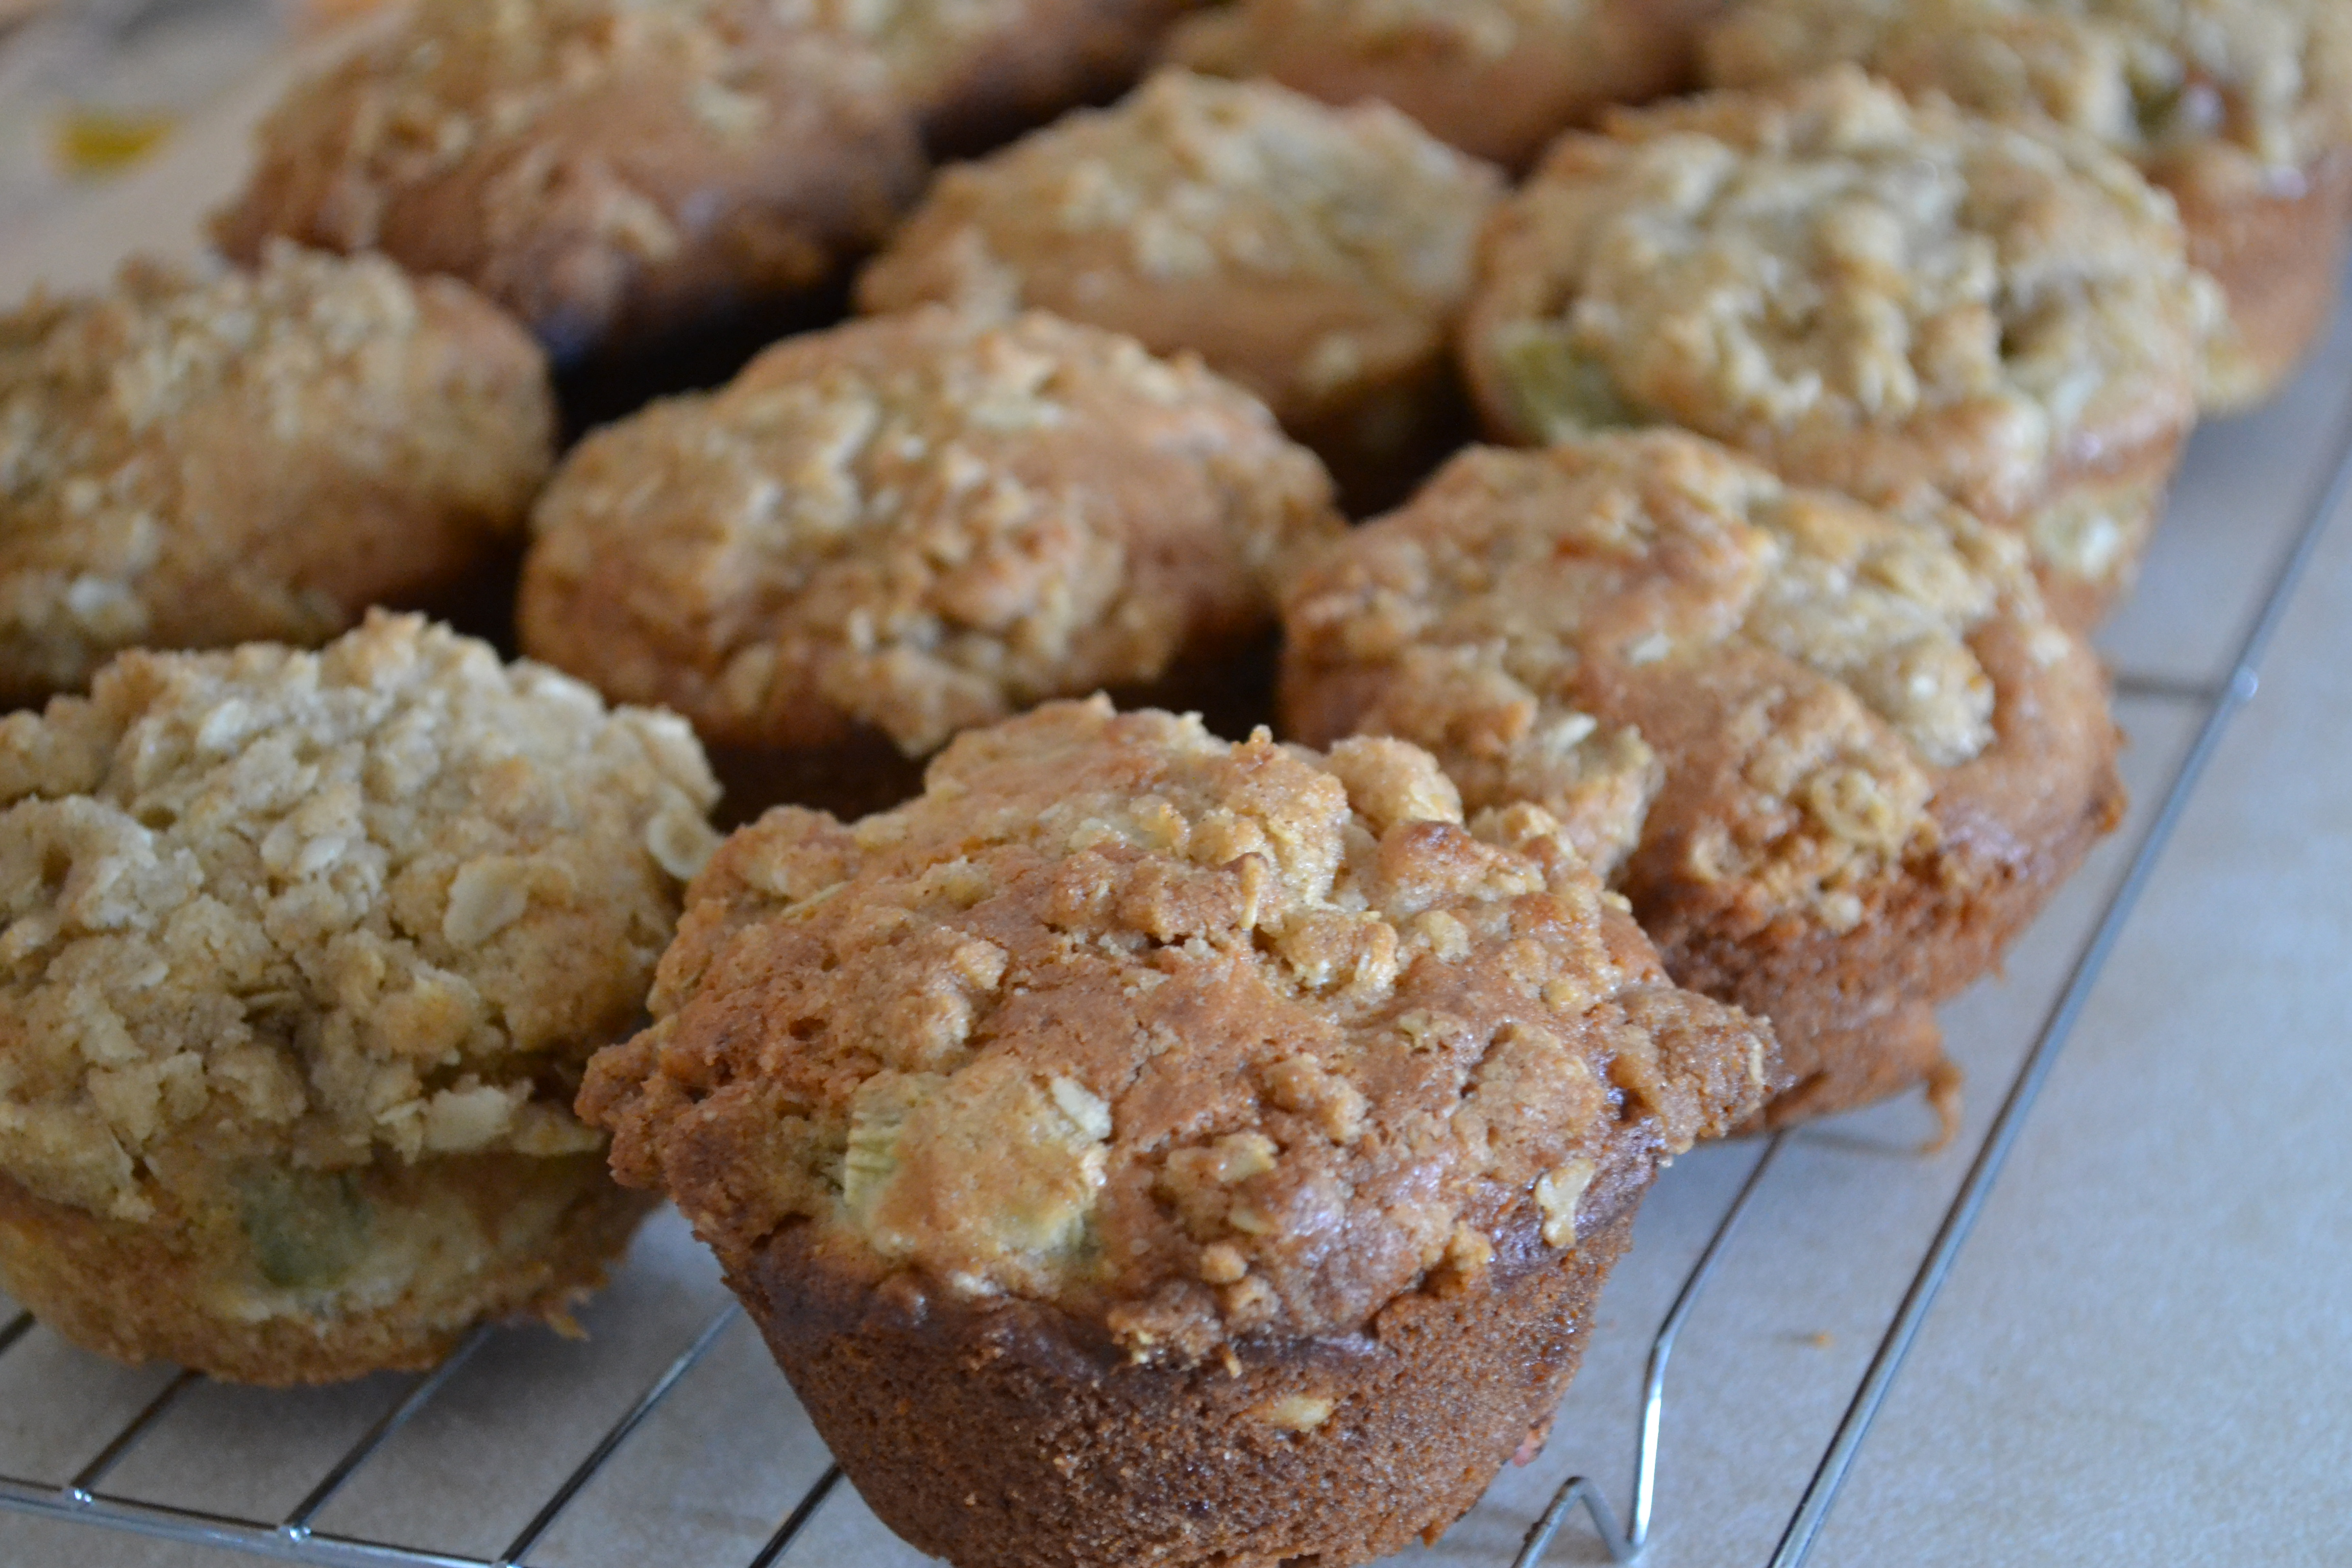 Rhubarb Muffins with Crumble Topping - Warm Vanilla Sugar